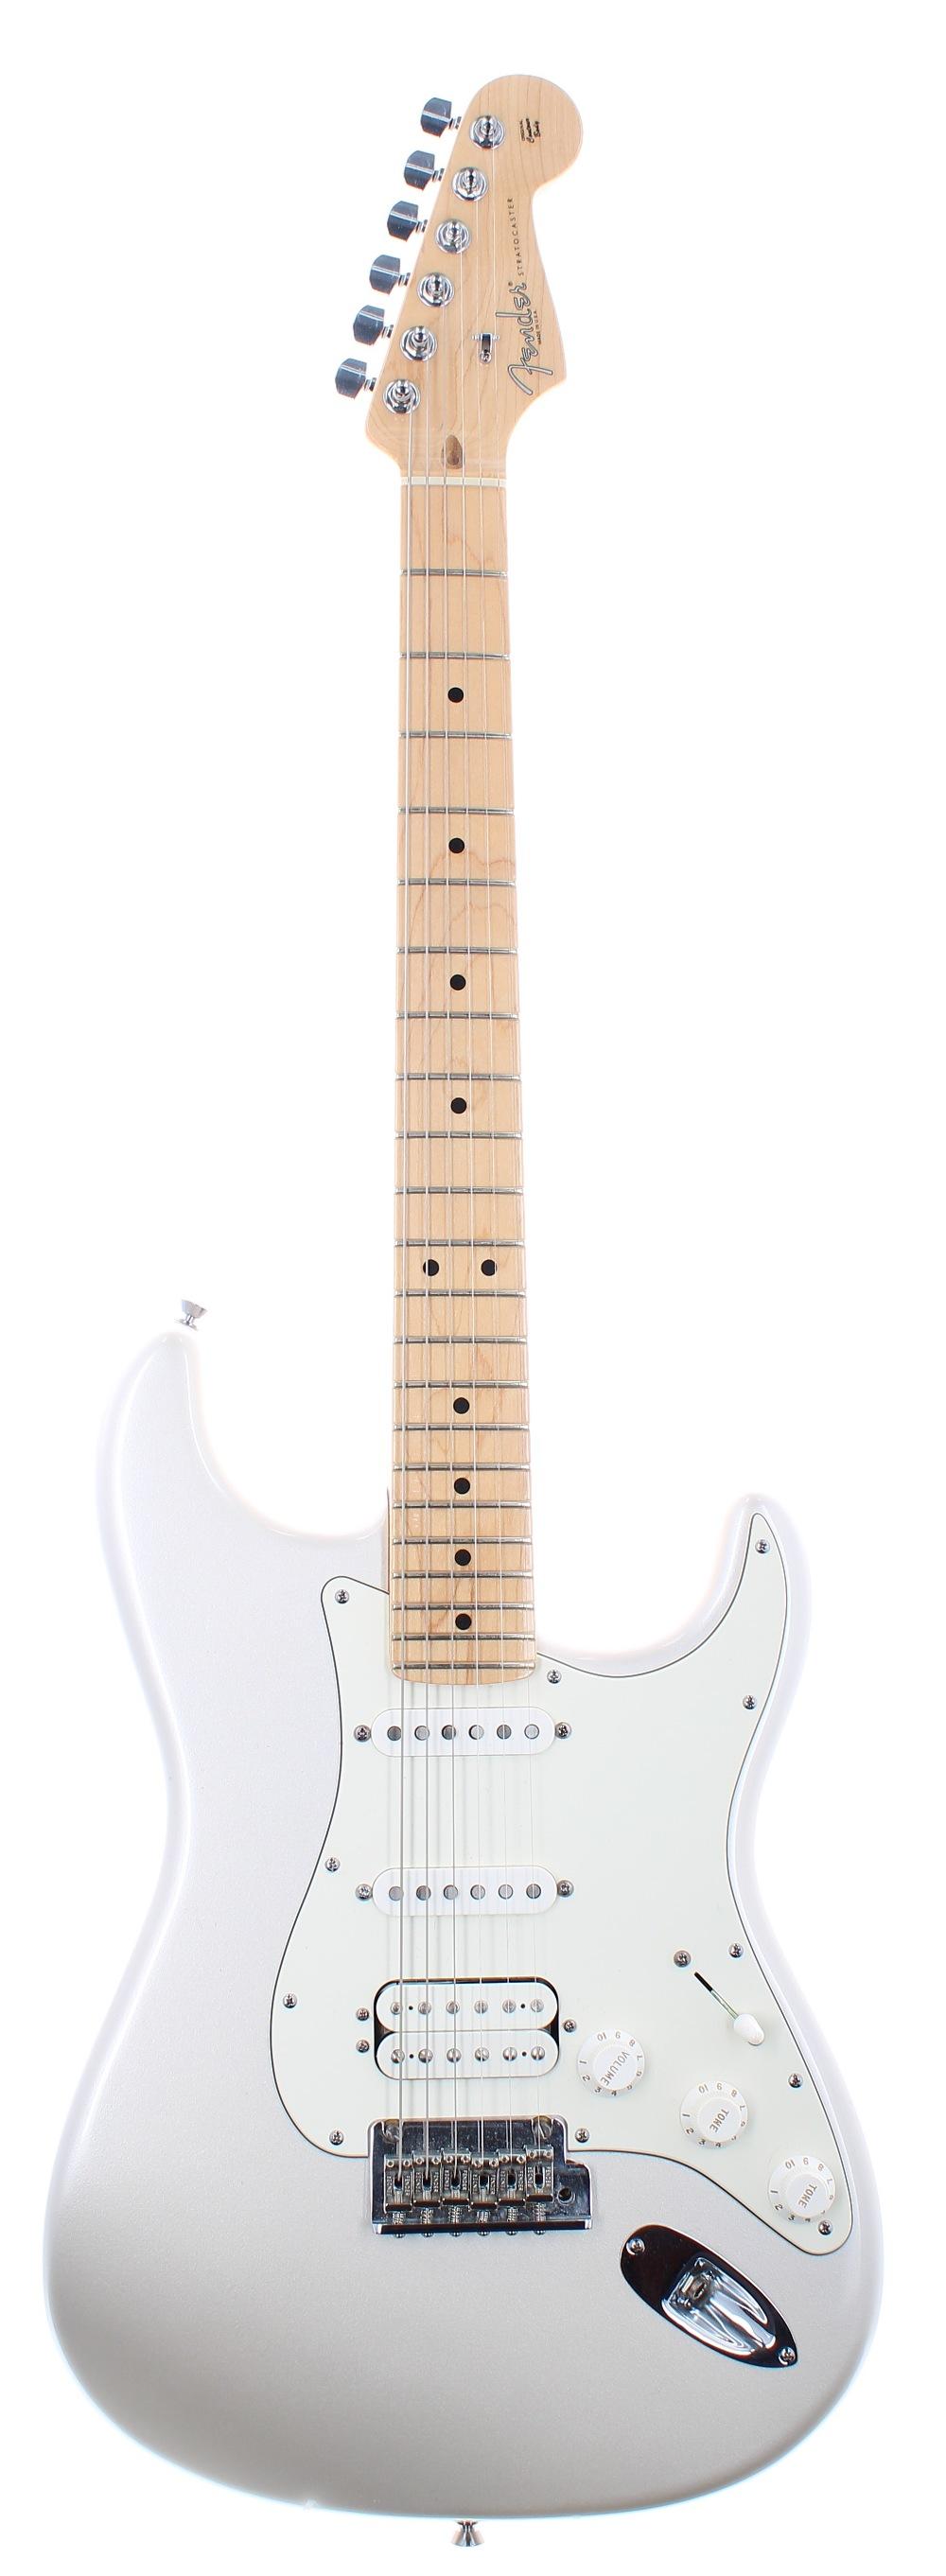 2009 Fender American Standard HSS Stratocaster electric guitar, made in USA, ser. no. Z9xxxxx5;